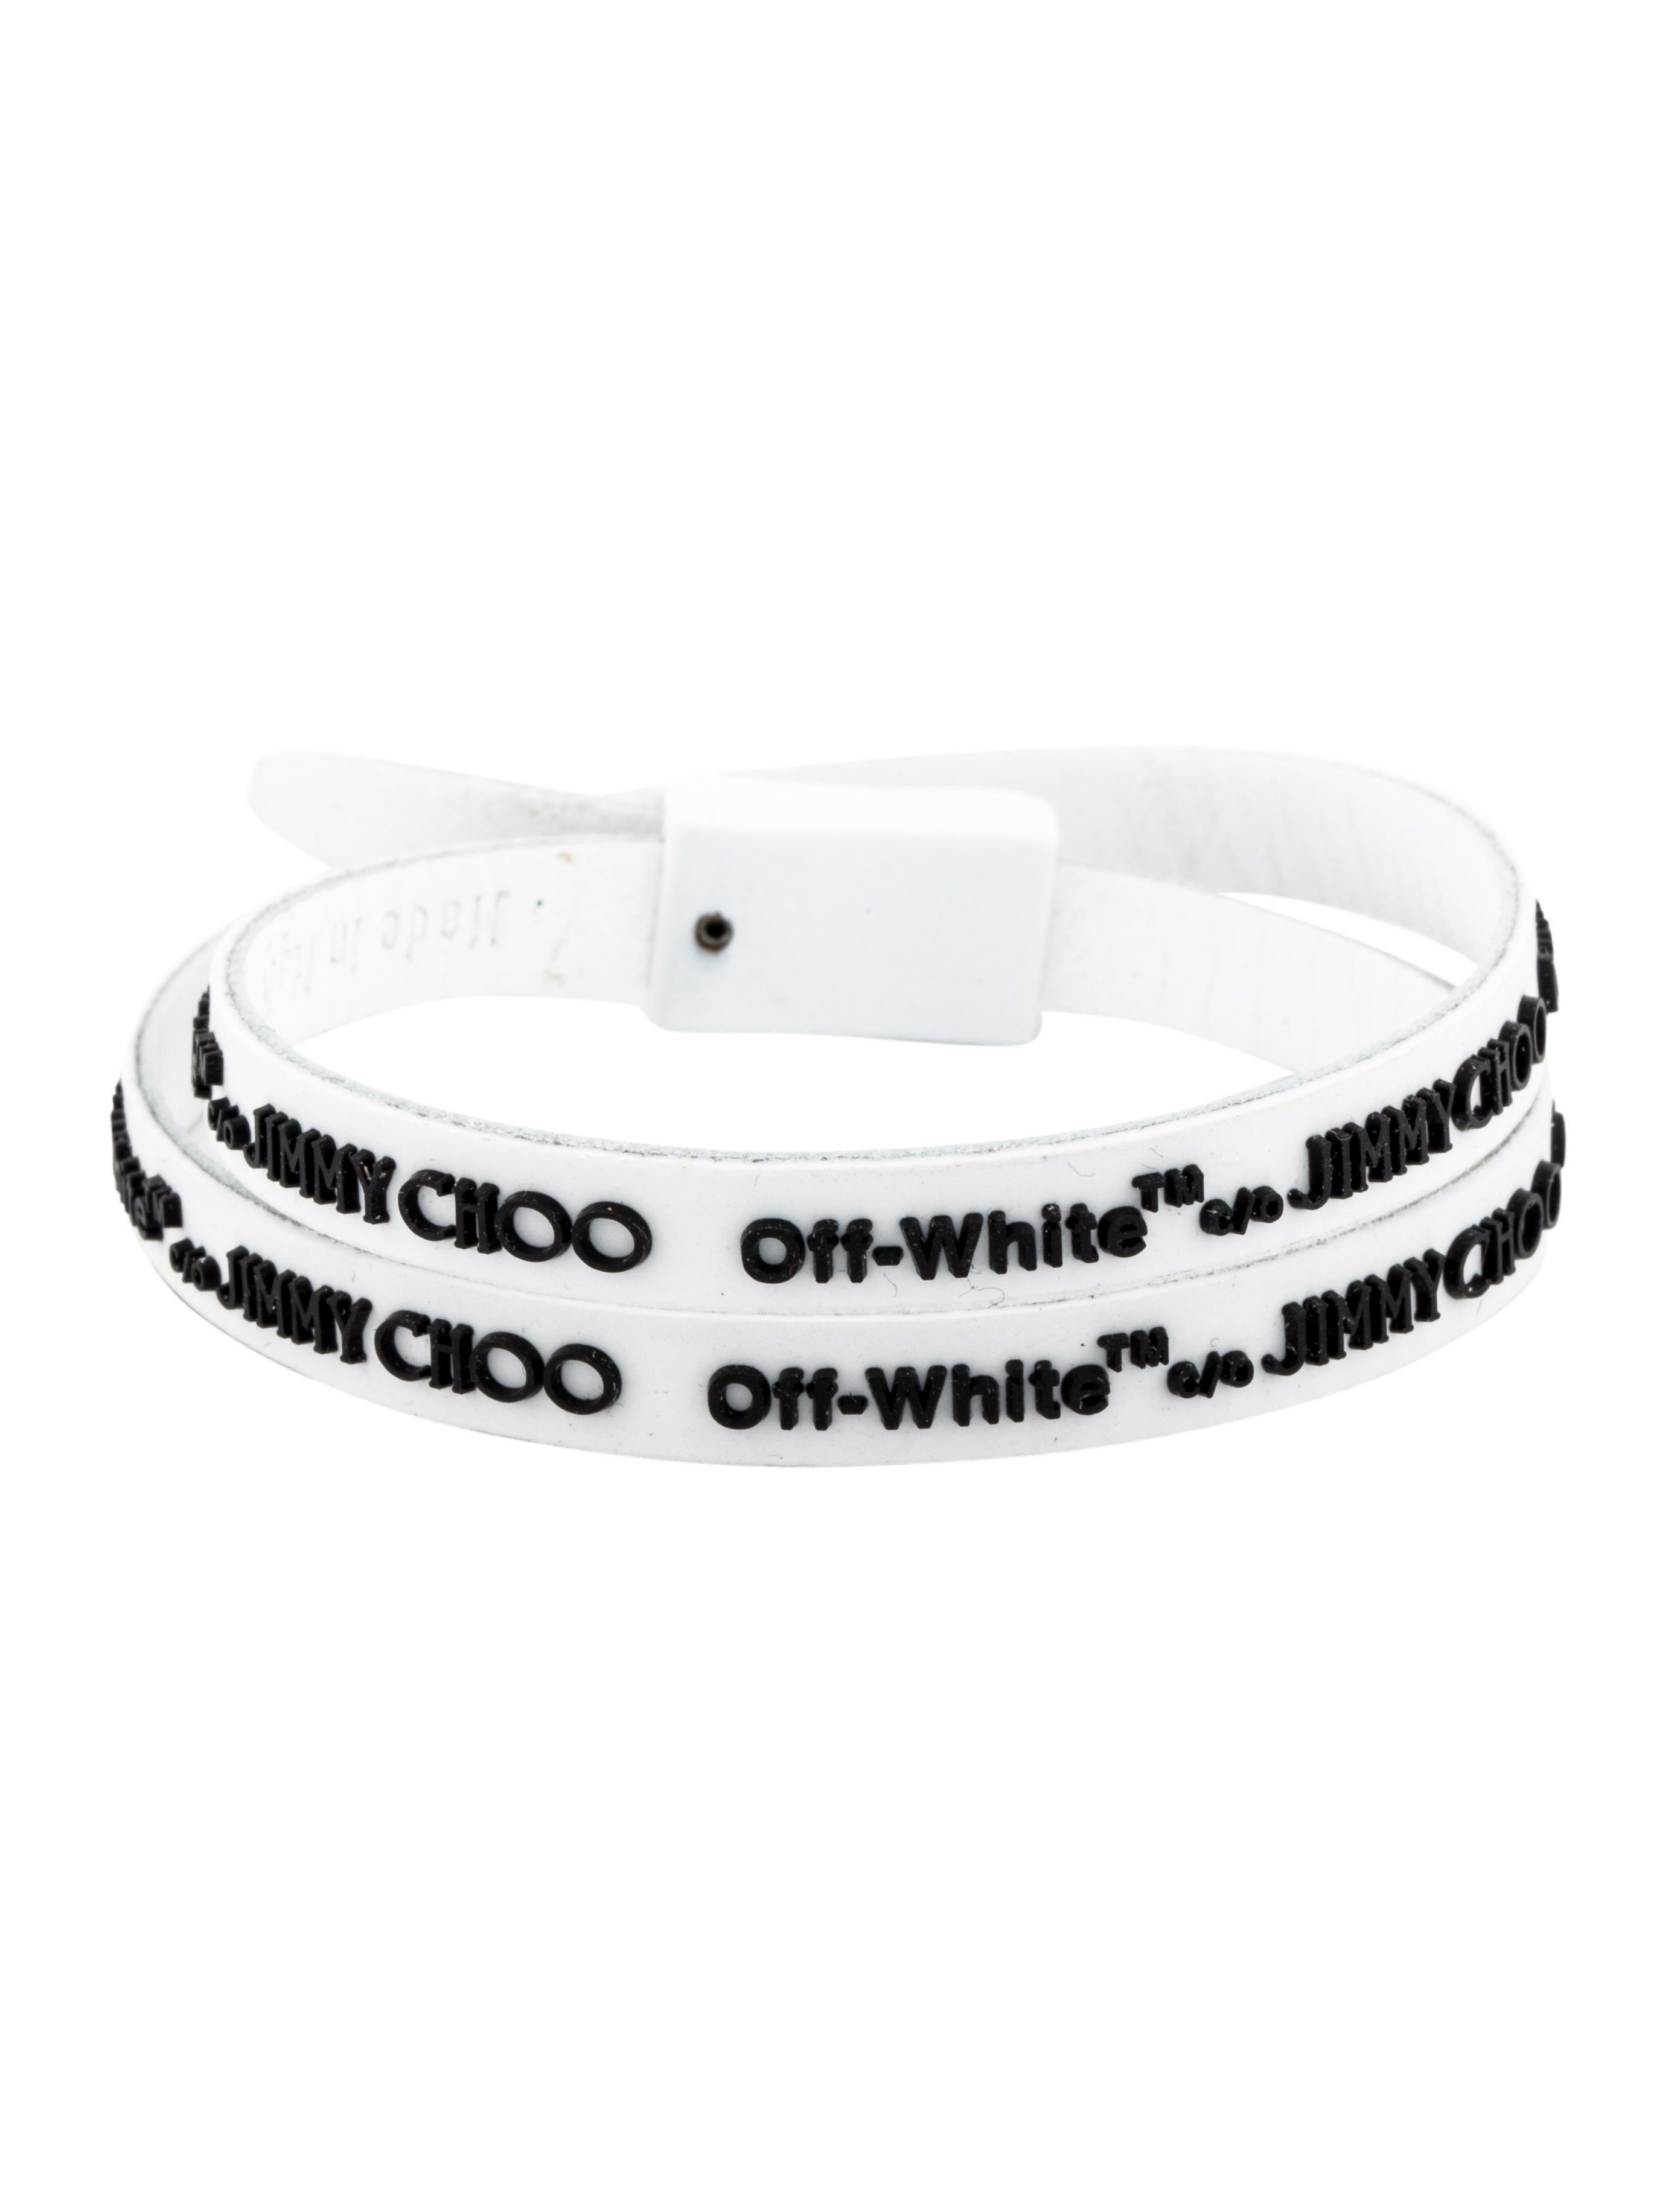 753d2651edc Off White X Jimmy Choo Logo Rubber Wrap Bracelet Bracelets. Off White C O  Jimmy Choo Collection Zhu Constance ...